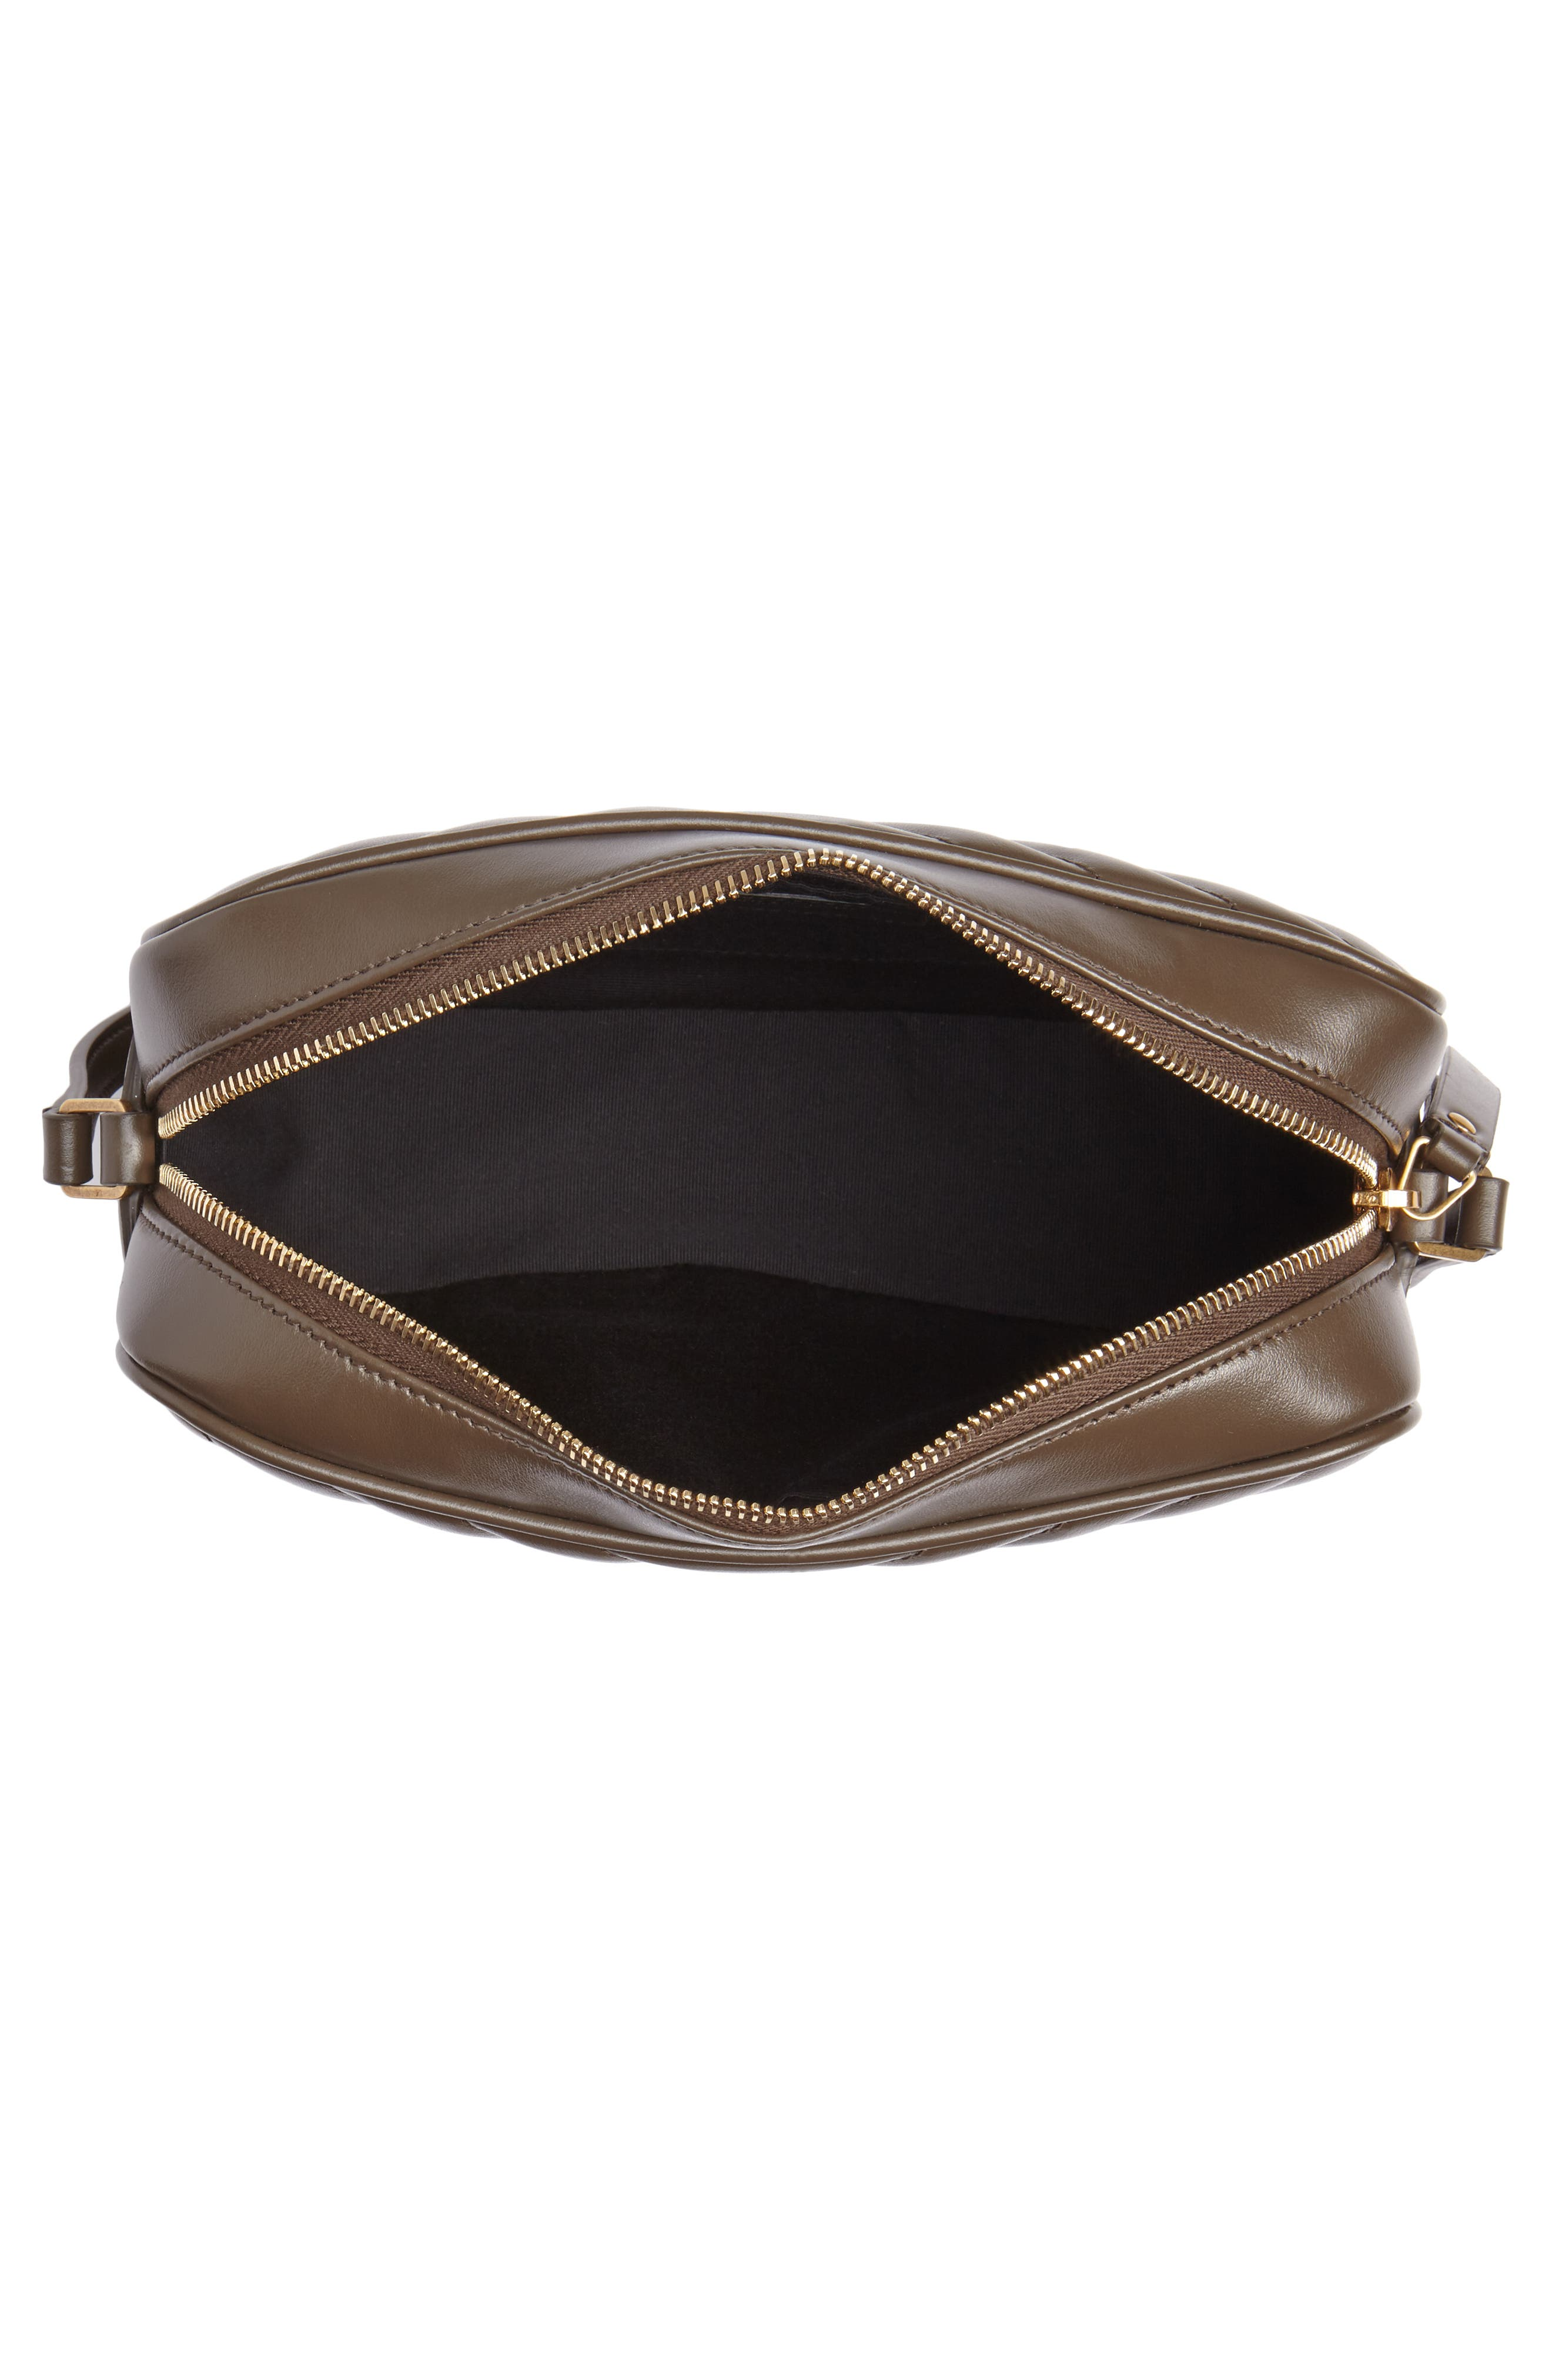 Medium Lou Calfskin Leather Camera Bag,                             Alternate thumbnail 4, color,                             200